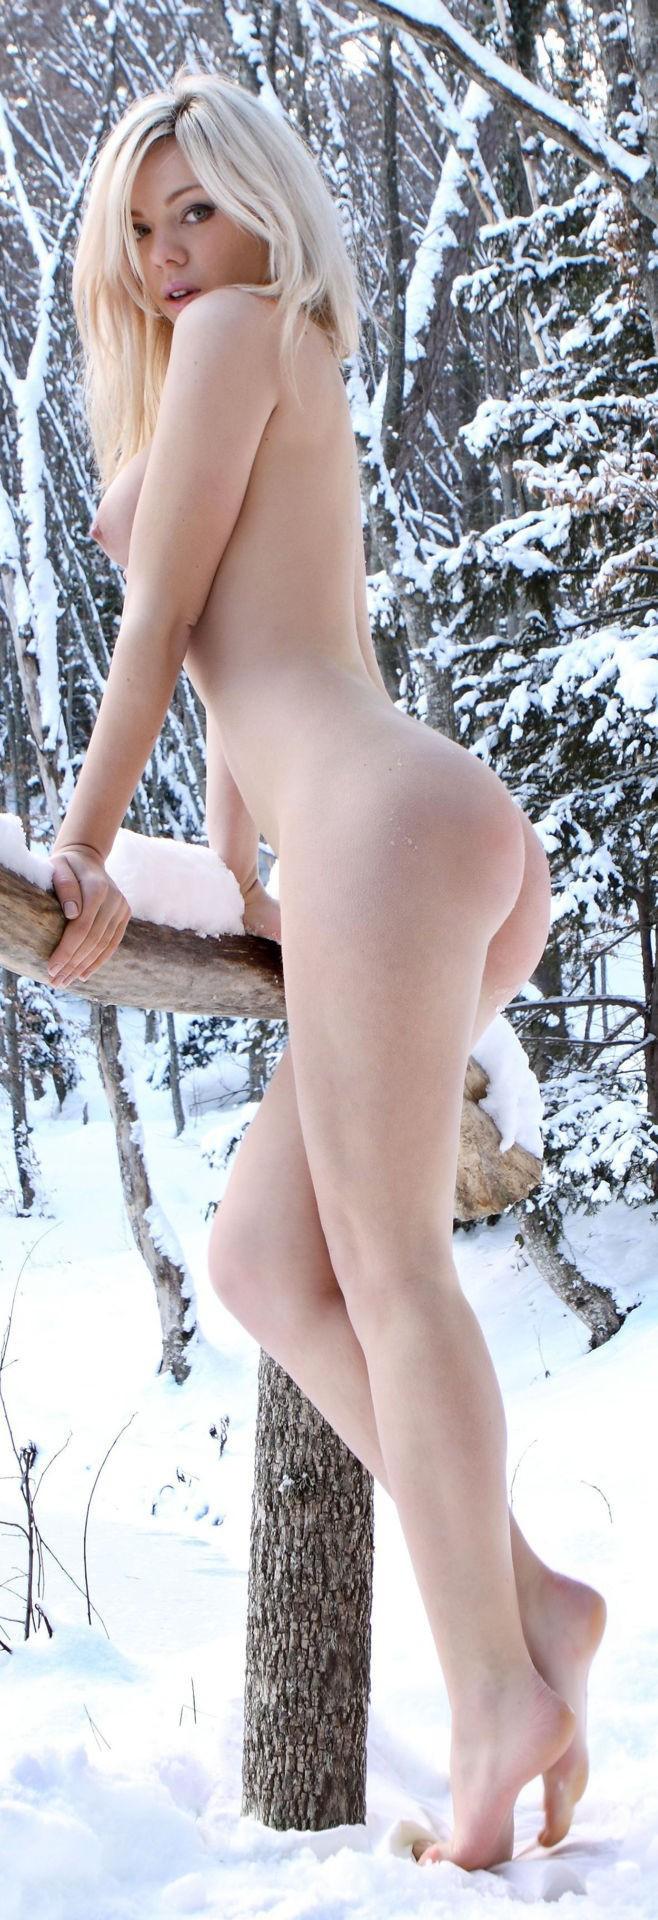 kyra hot porn star videos free movies